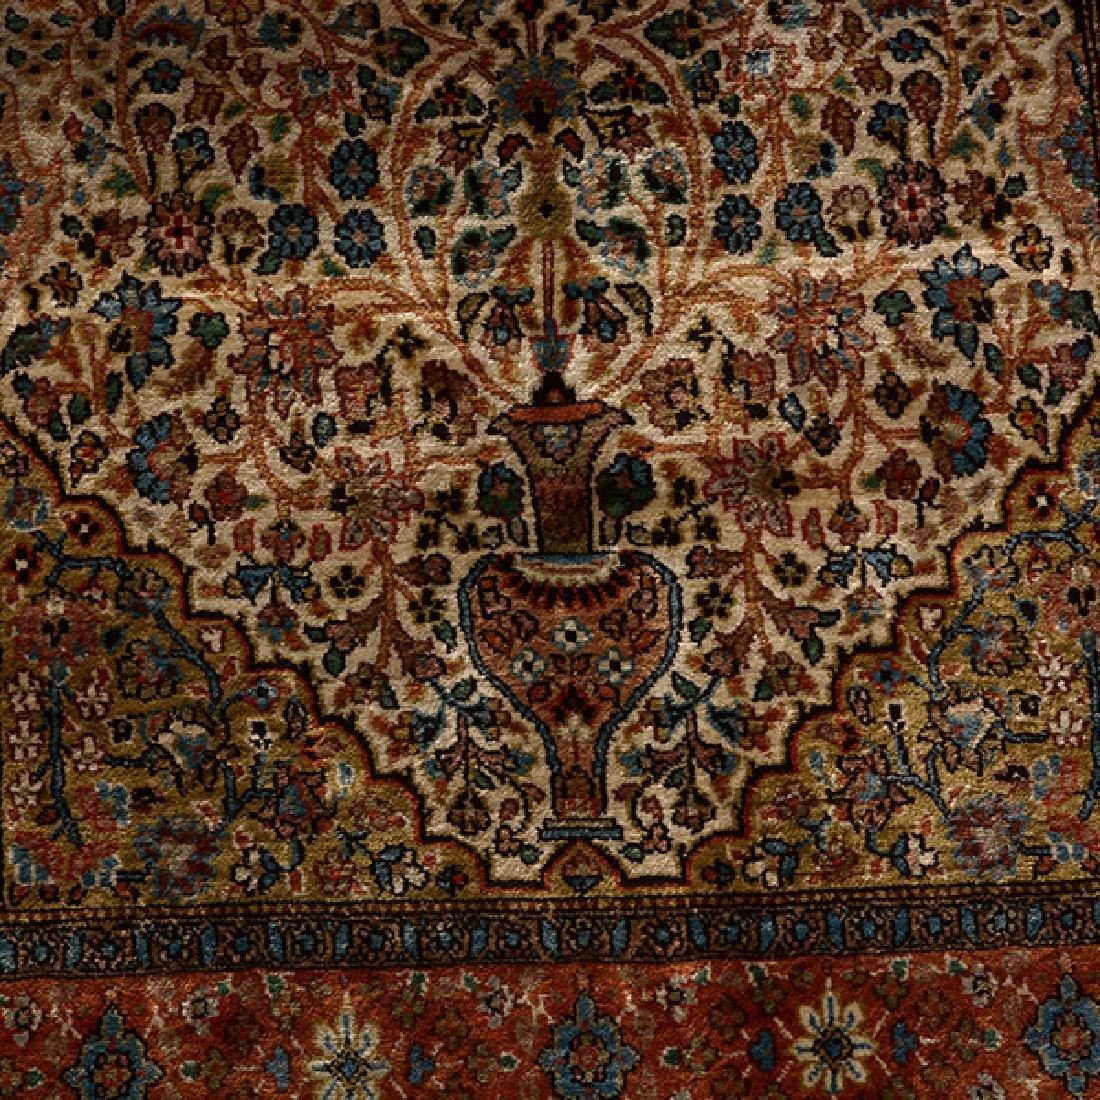 Egyptian Silk Prayer Rug: 2 feet 6 inches x 4 feet 3 - 4